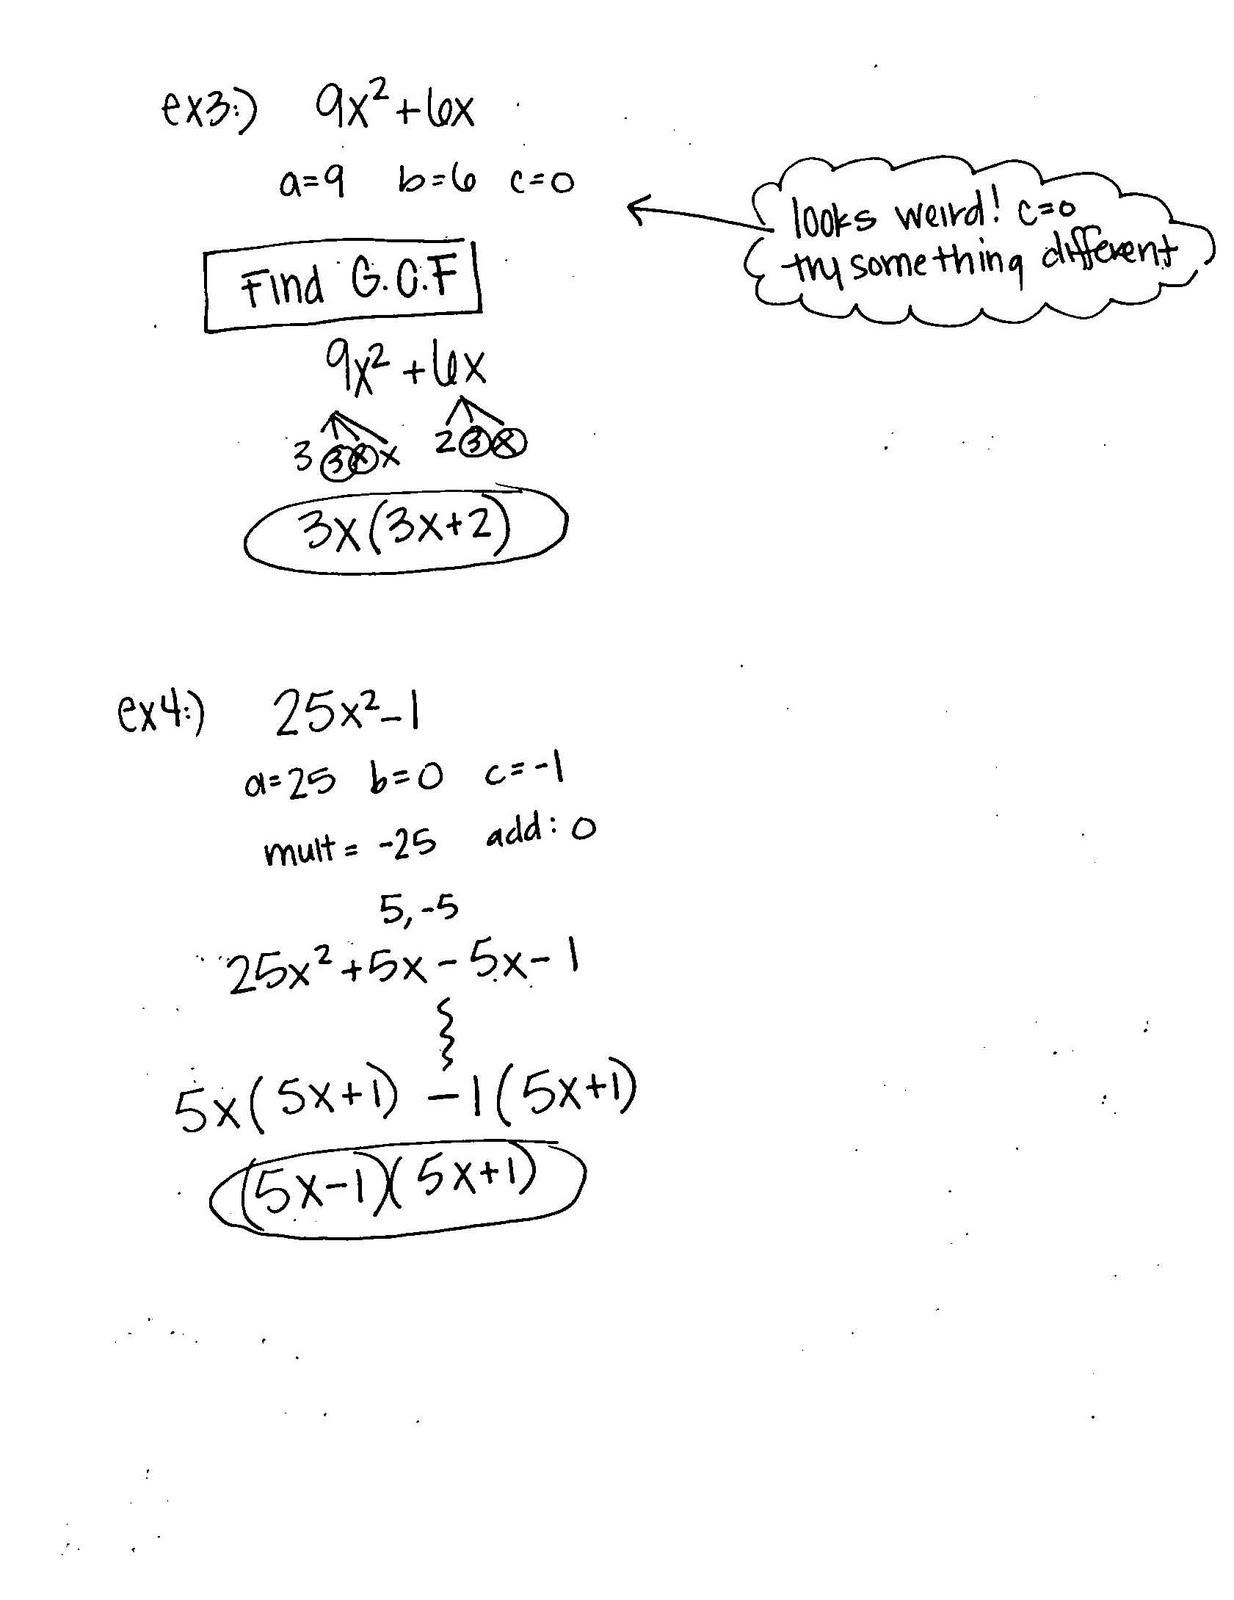 Algebra 1 Unit 7 Day 5 Factoring Polynomials Continued